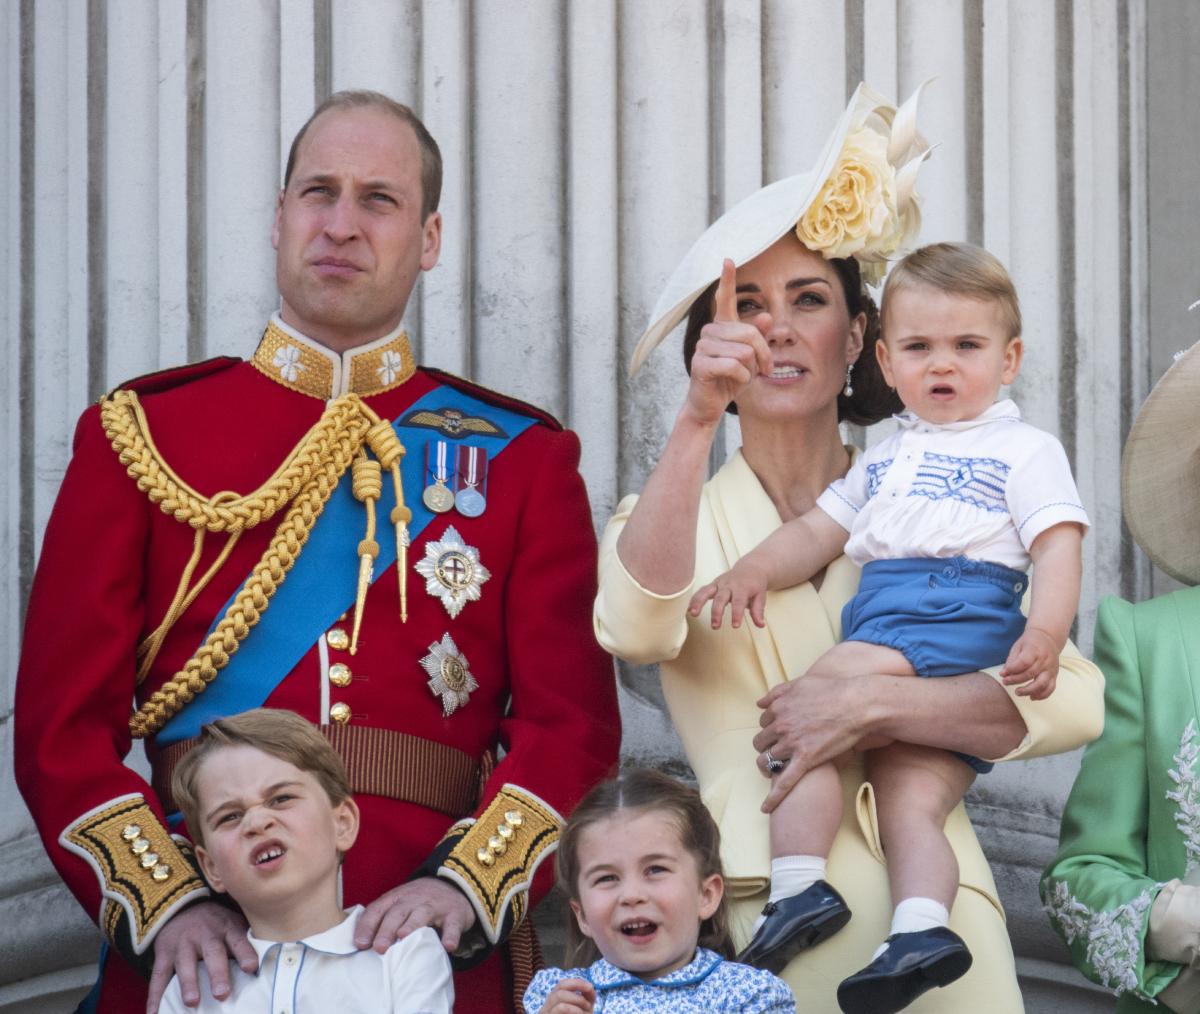 Prince William Prince Charlotte